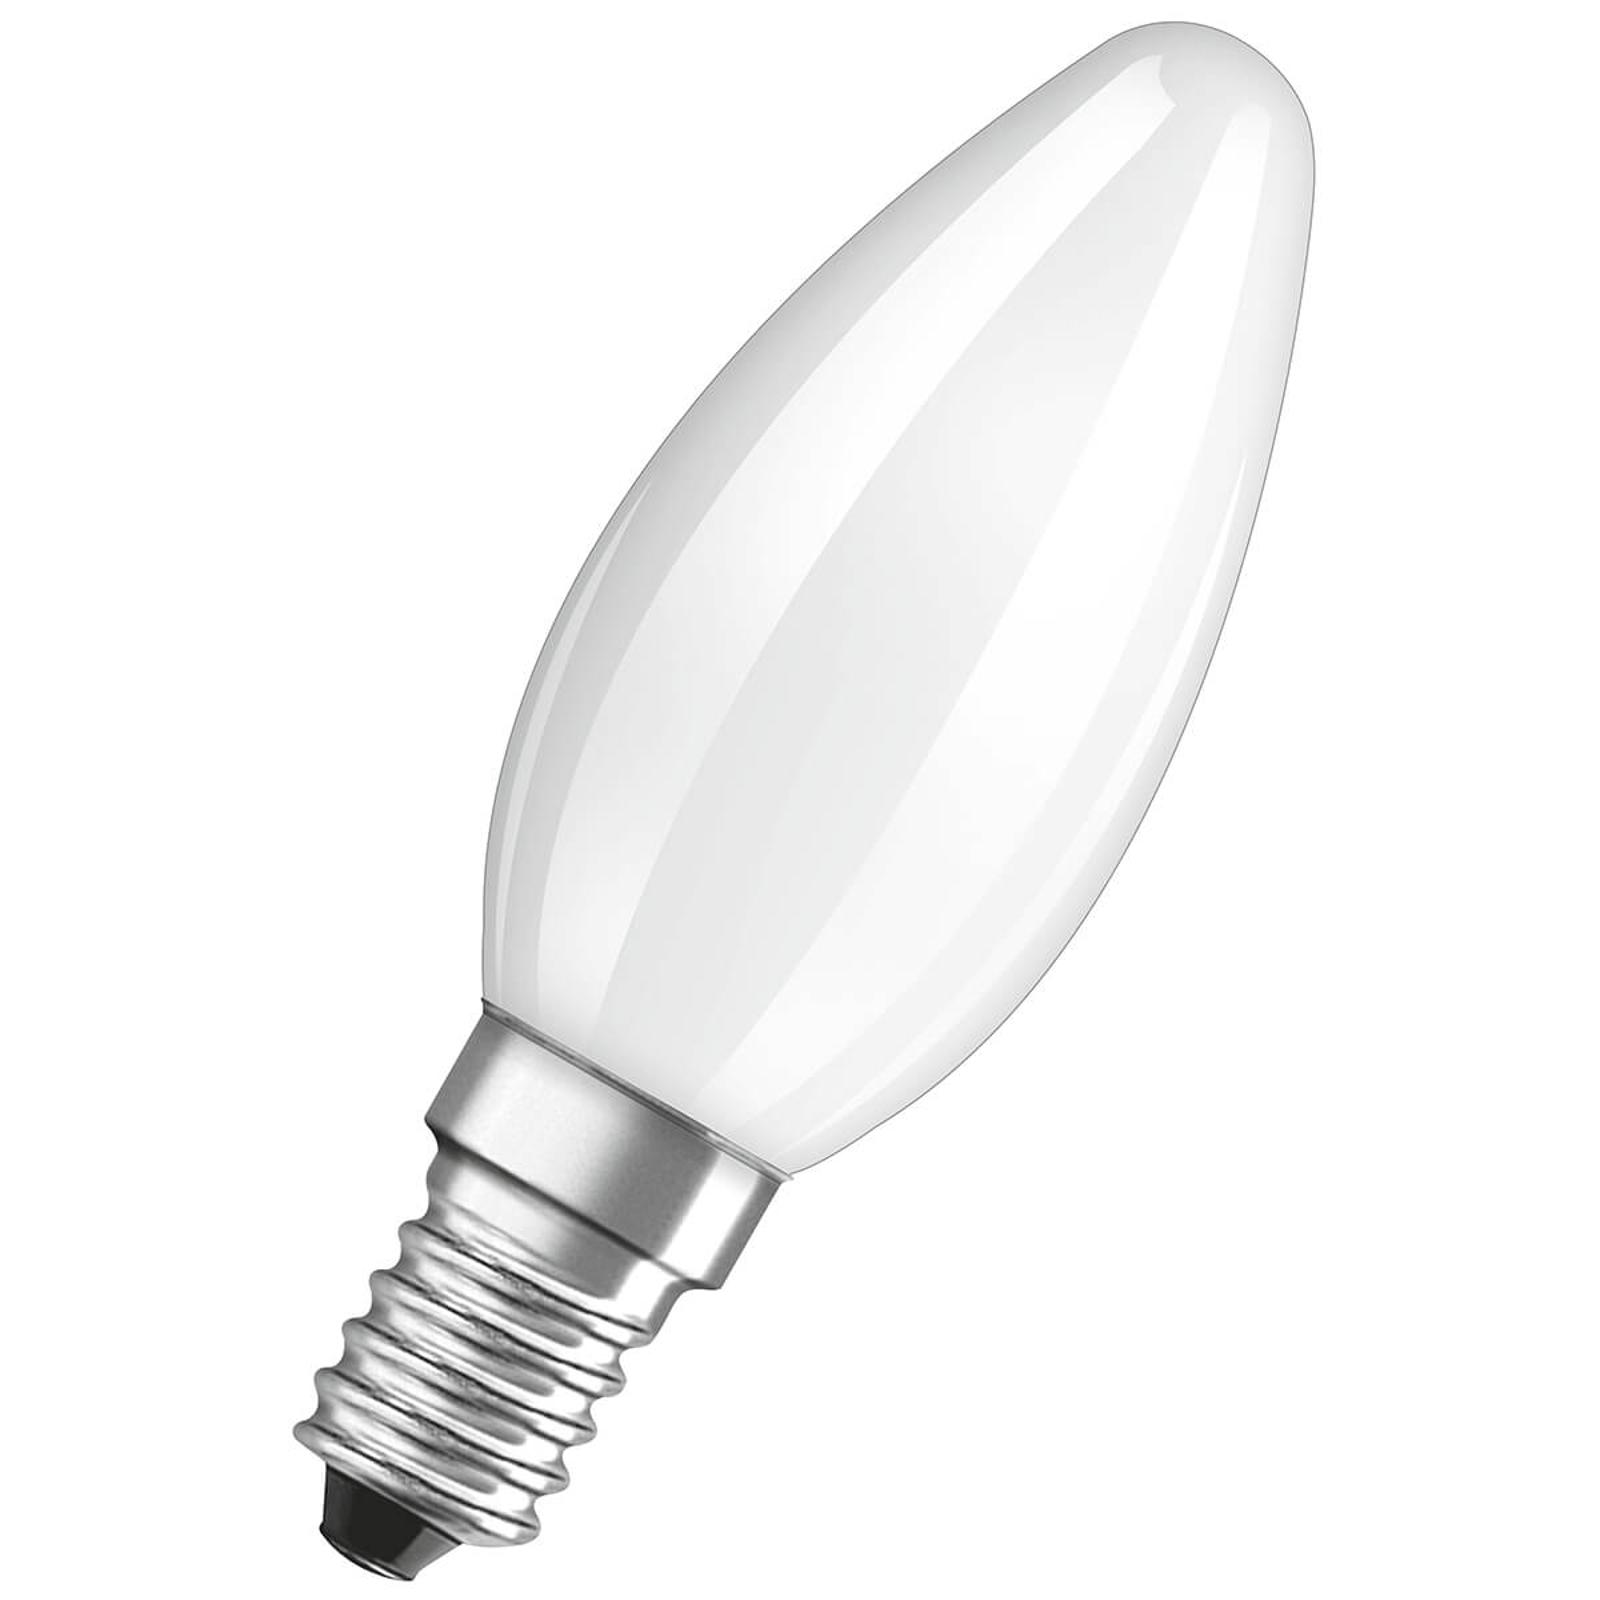 OSRAM-LED-kynttilälamppu E14 4W 4 000 K matta